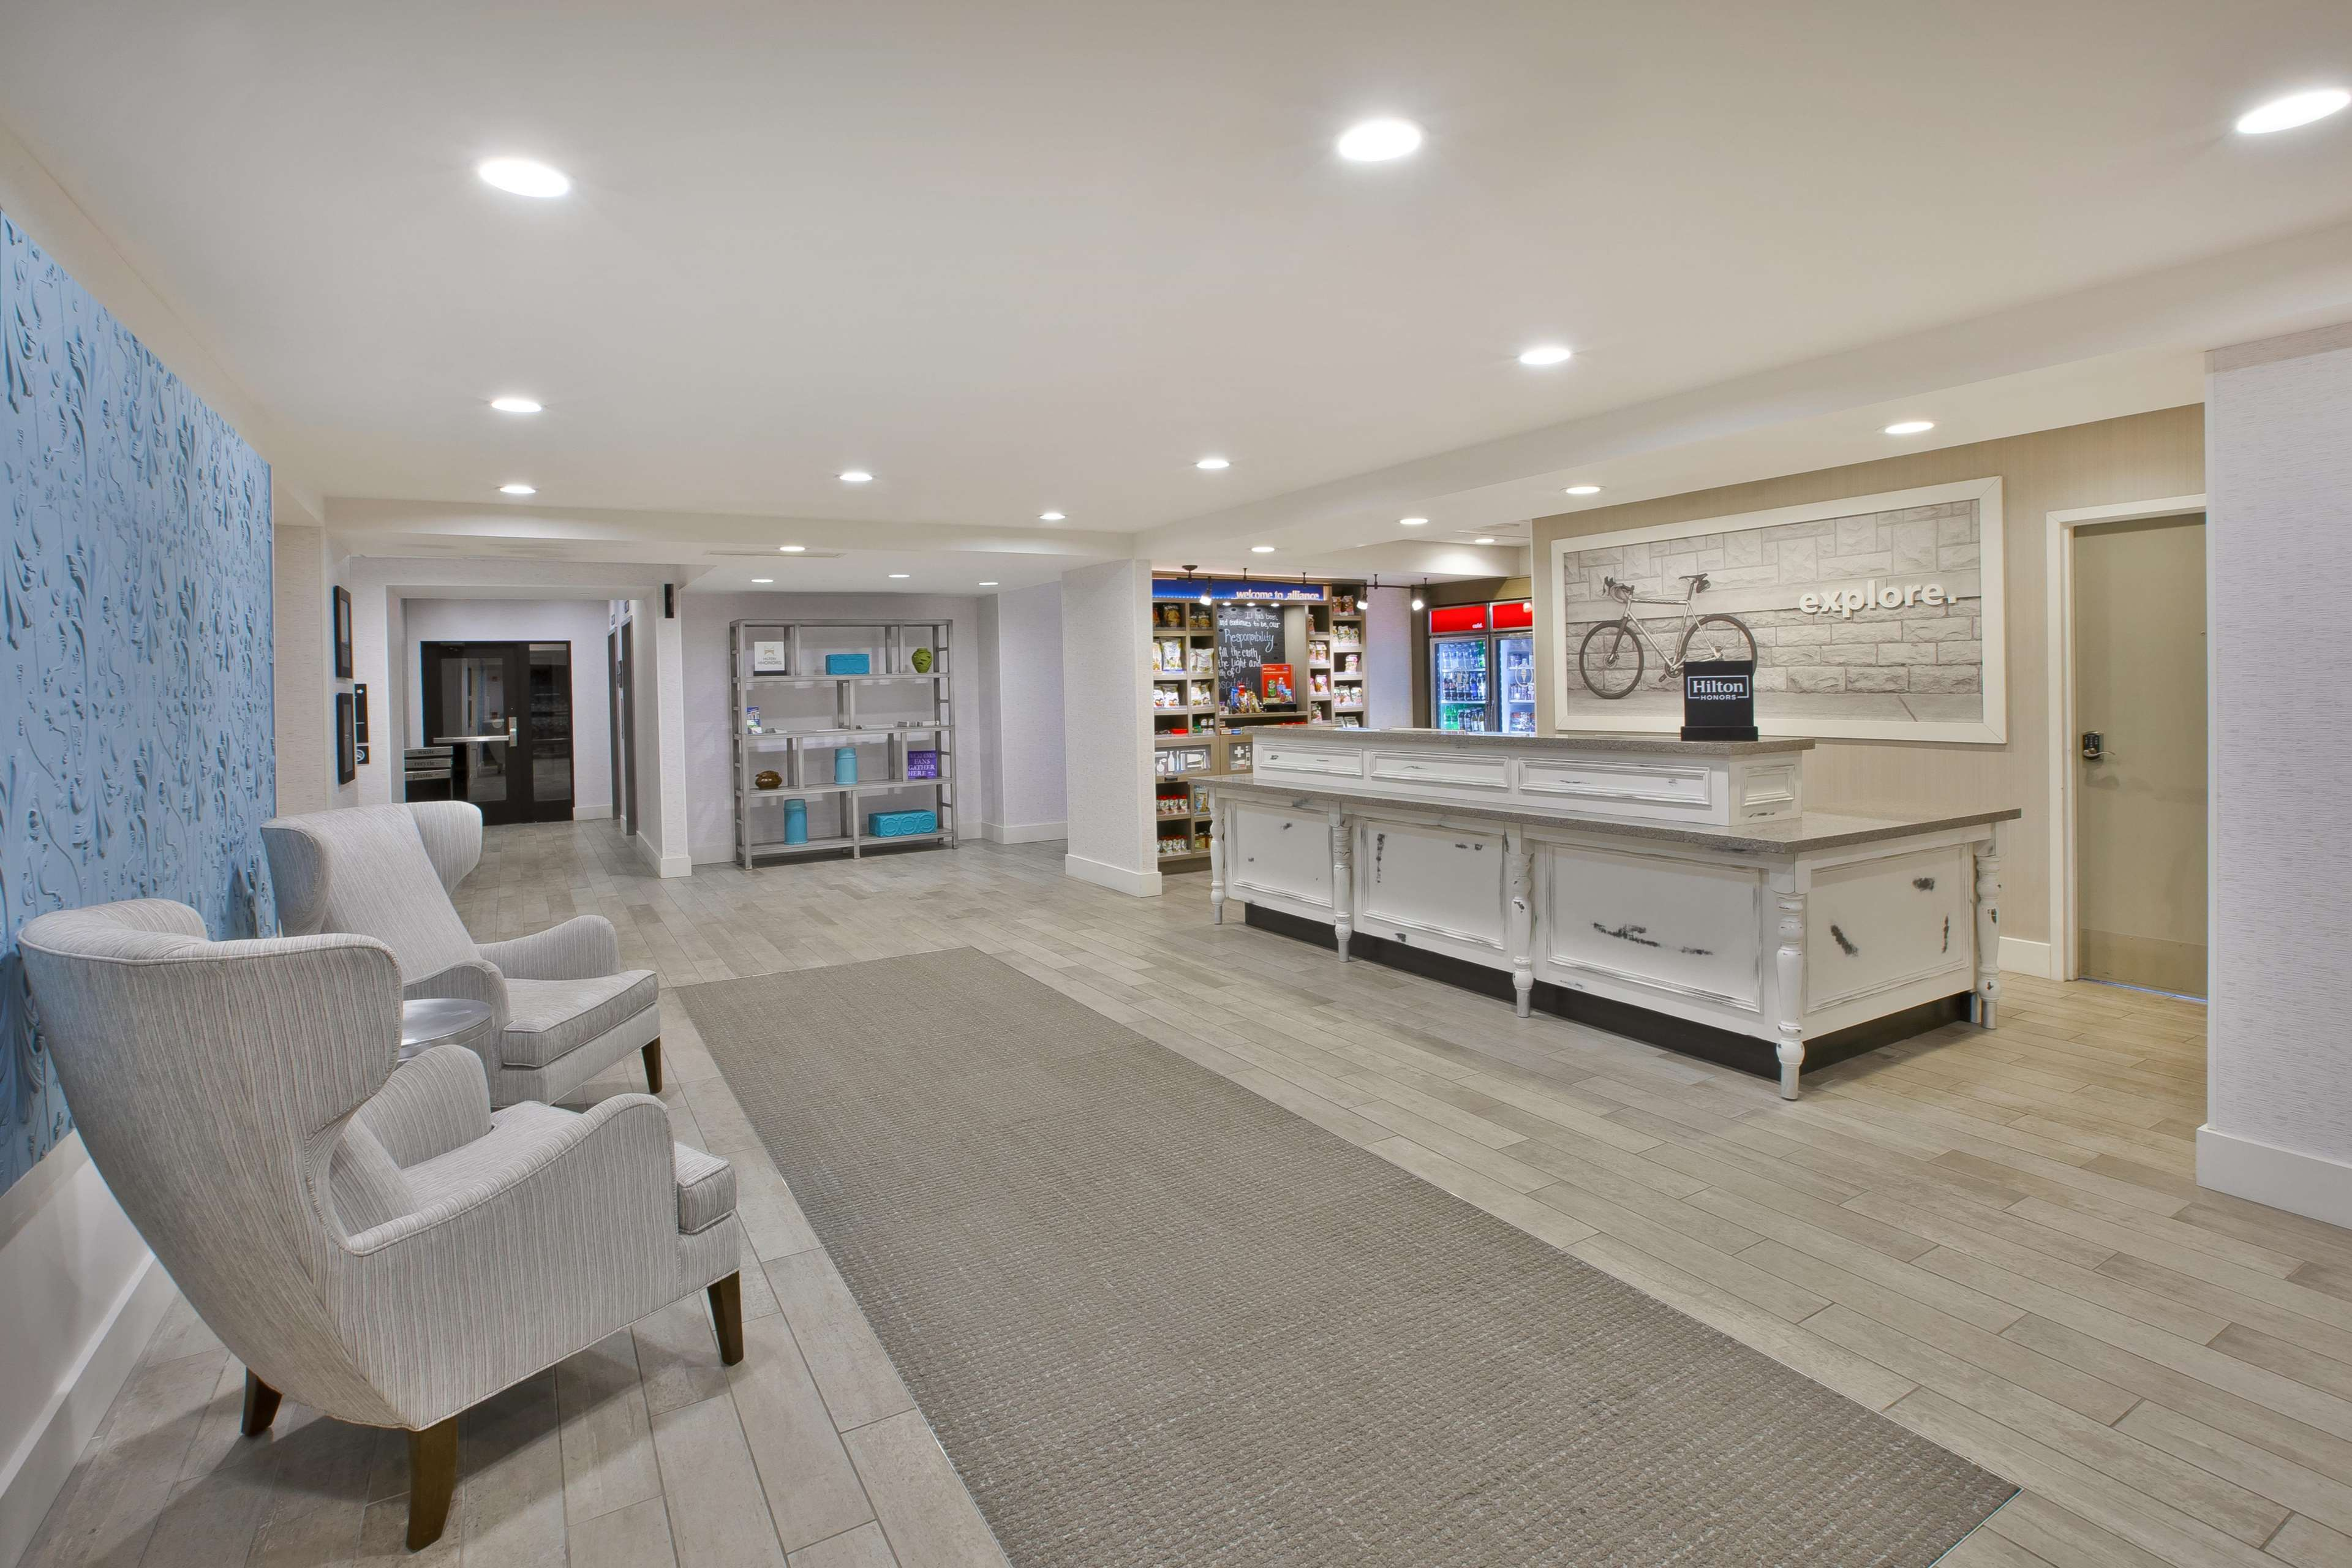 Hampton Inn & Suites Alliance image 4